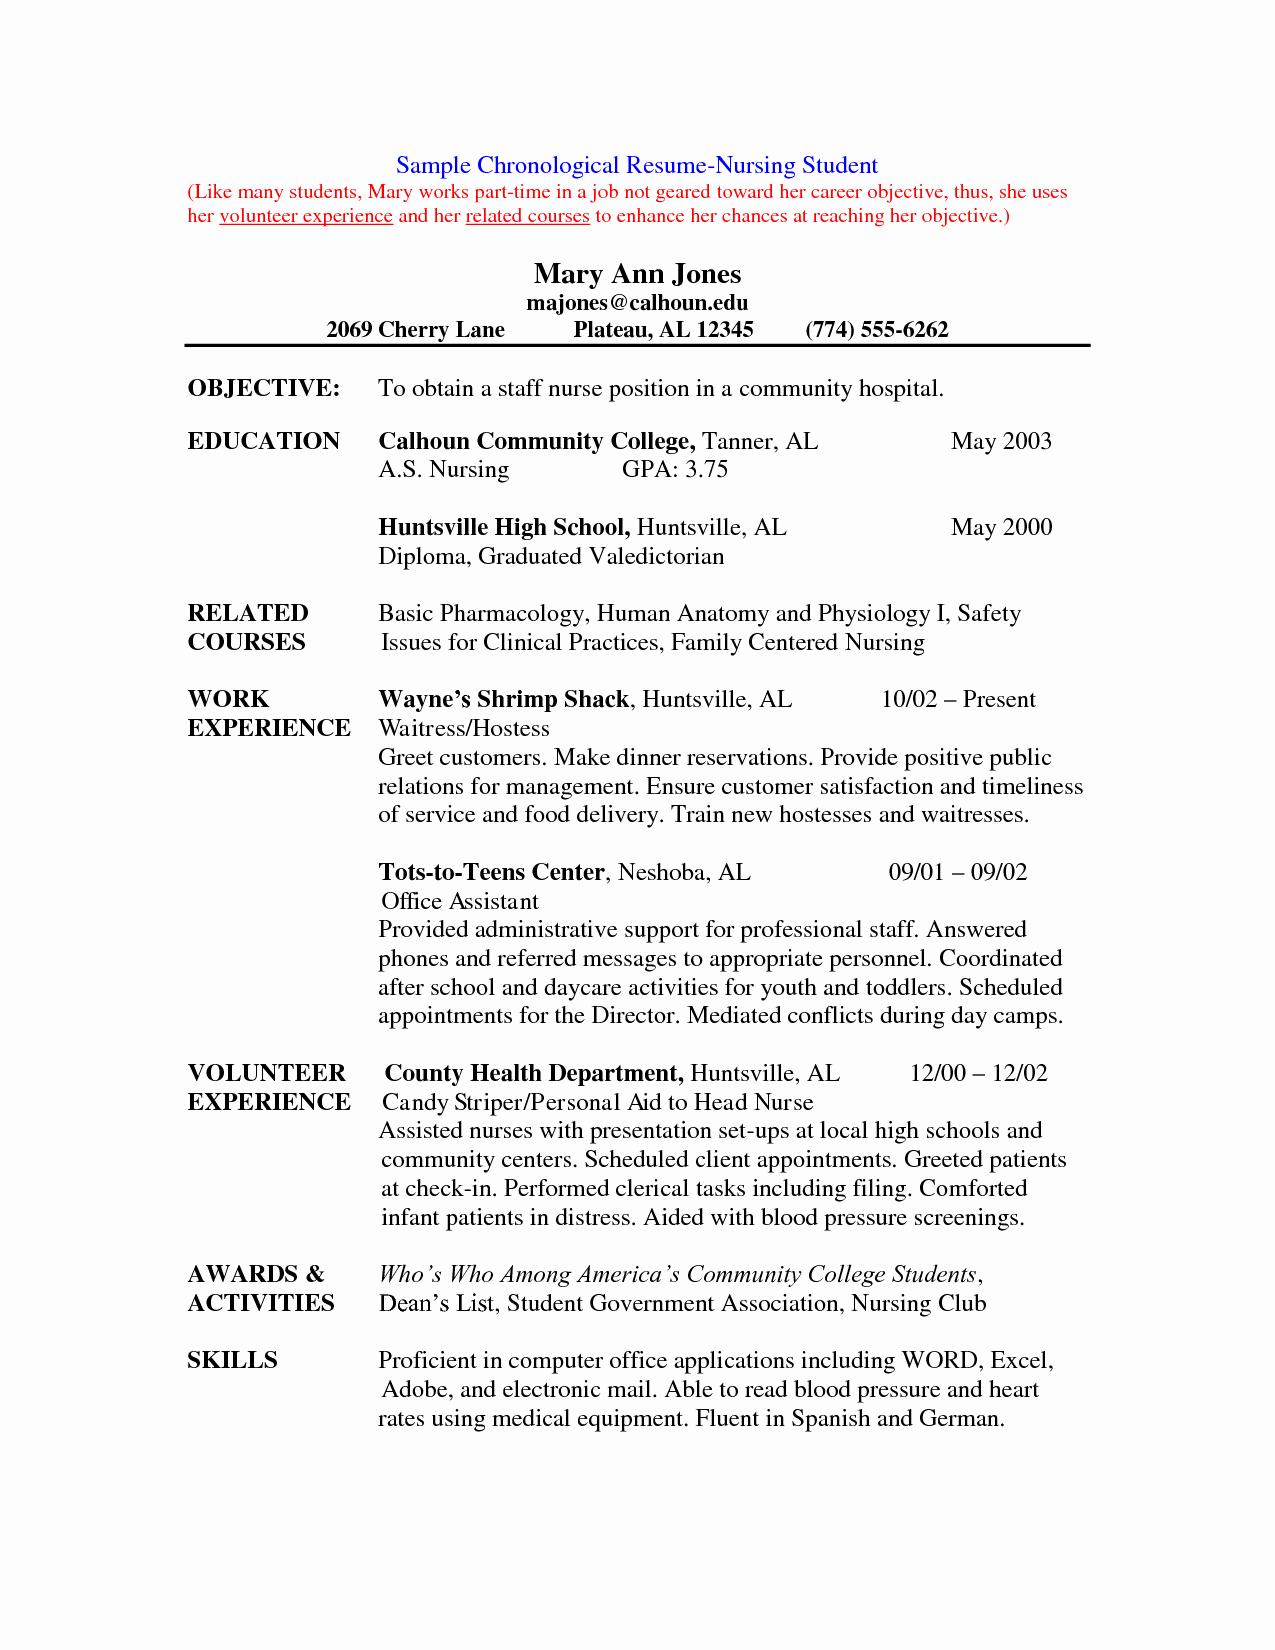 Nursing Student Resume Templates Fresh Cover Letters for Nursing Job Application Pdf Nursing Pinterest